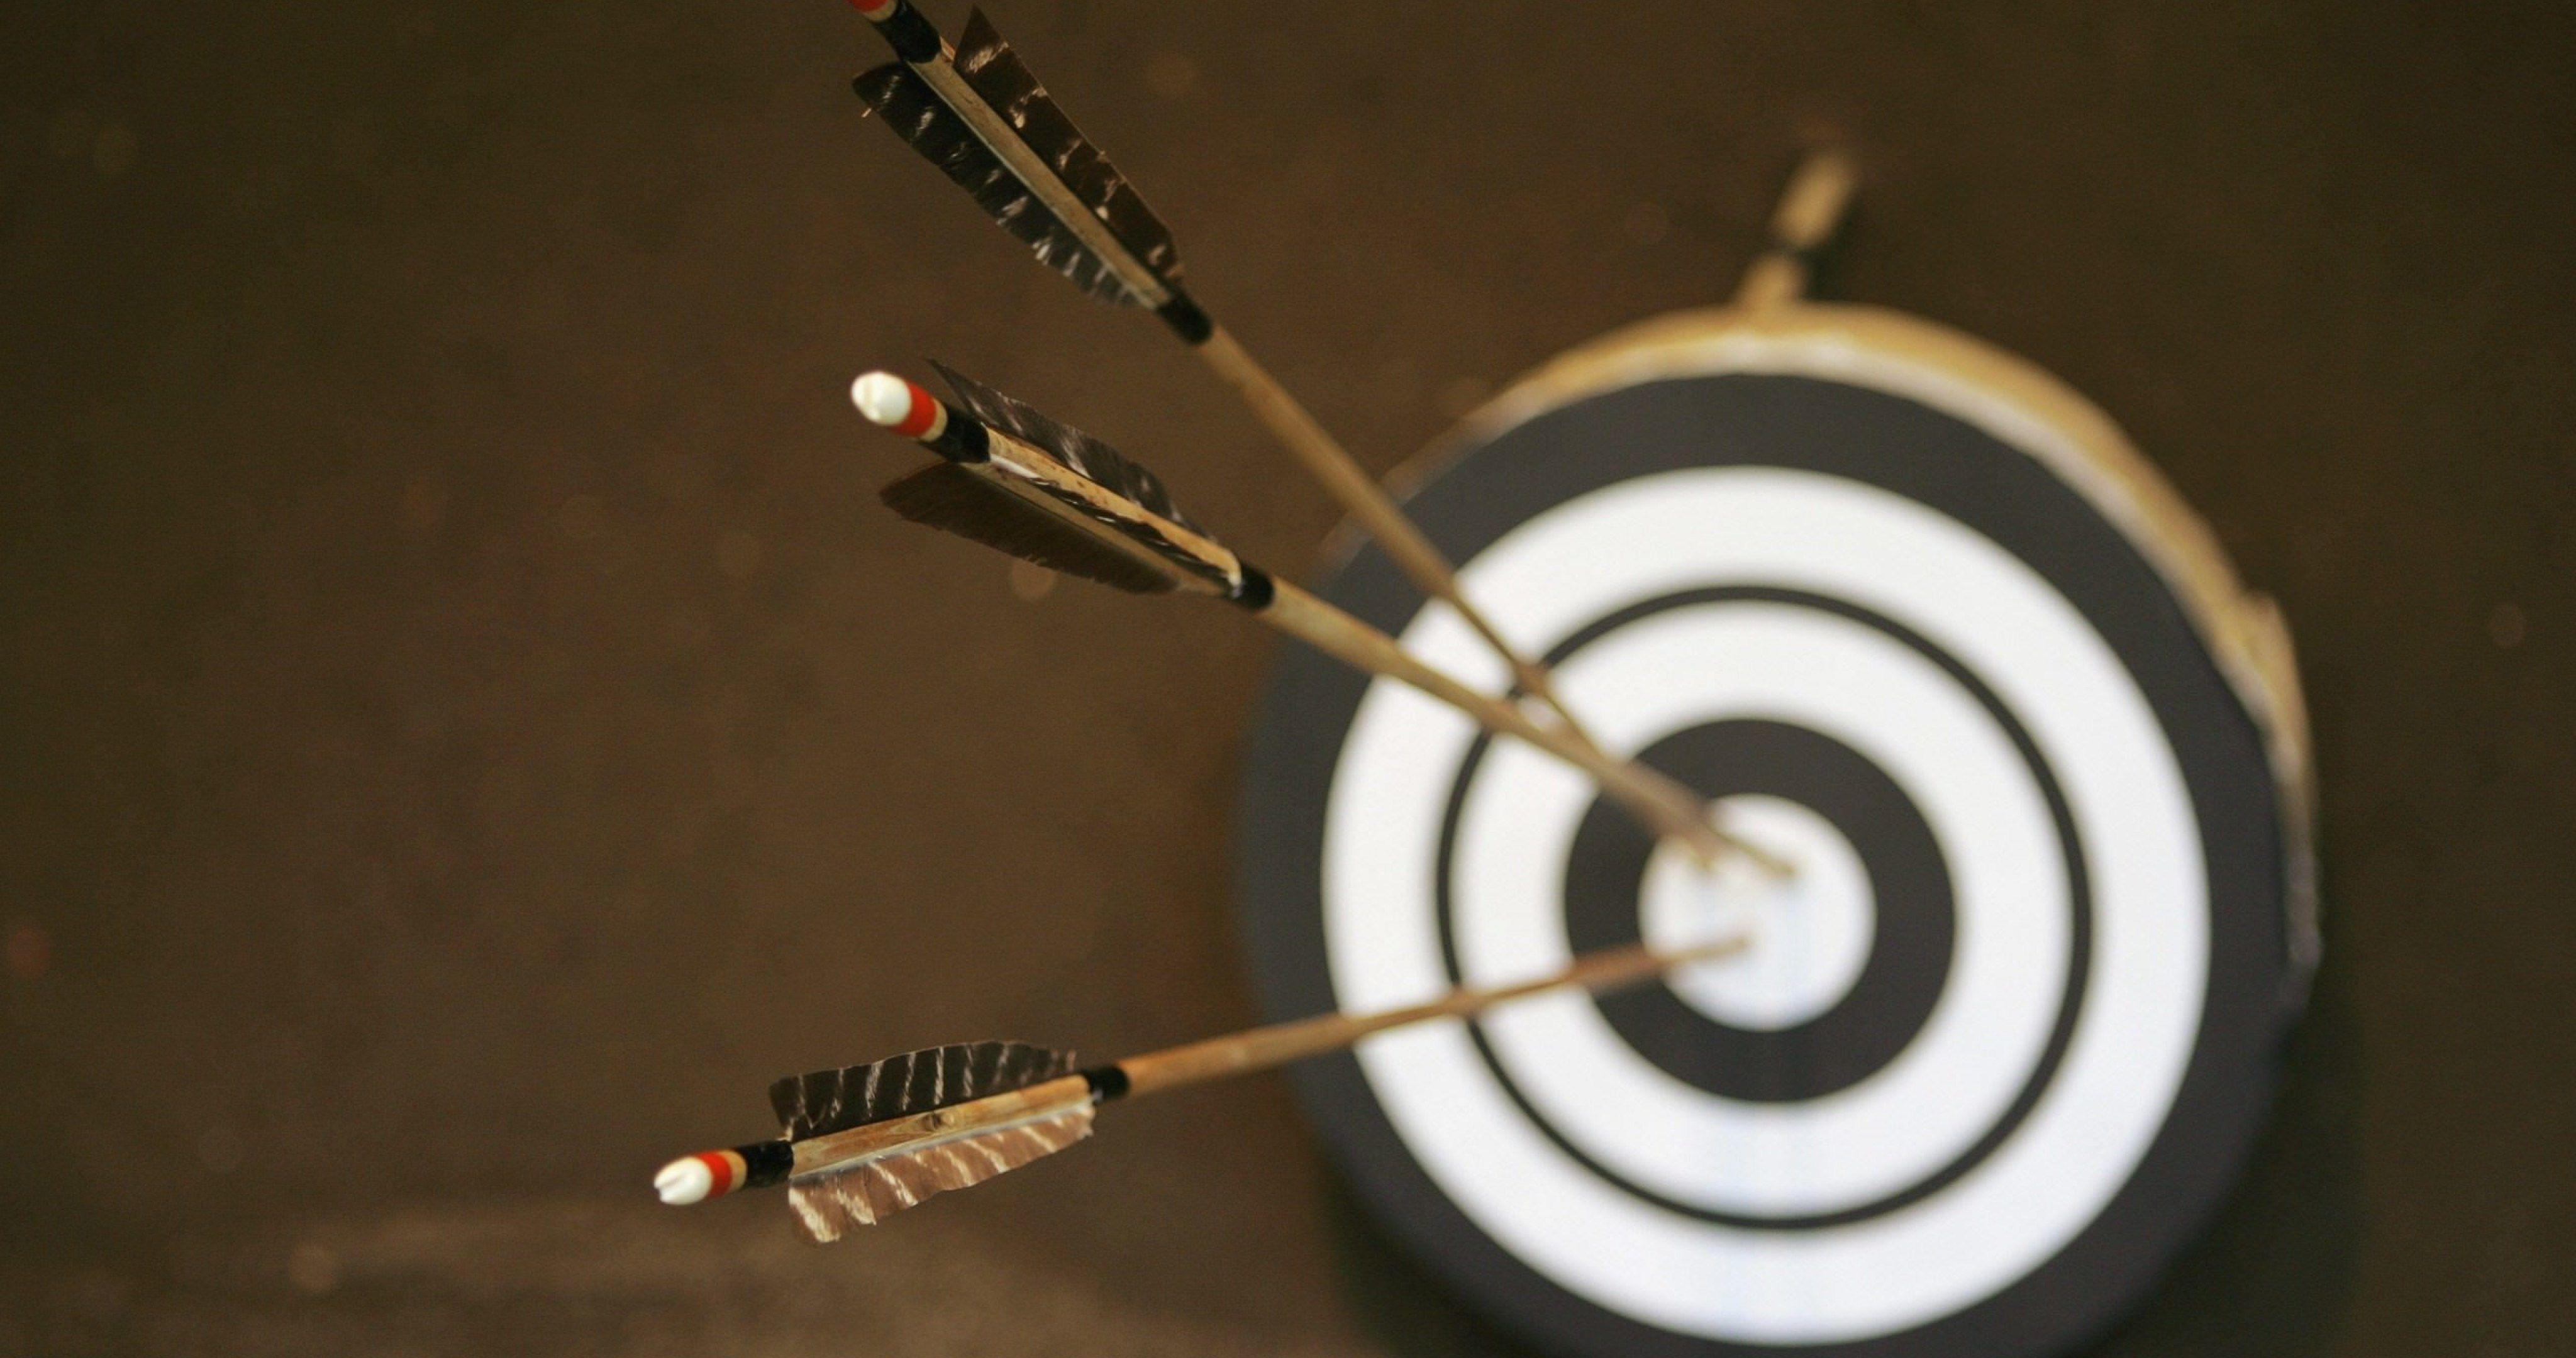 three arrows center of the target bullseye 4k ultra hd